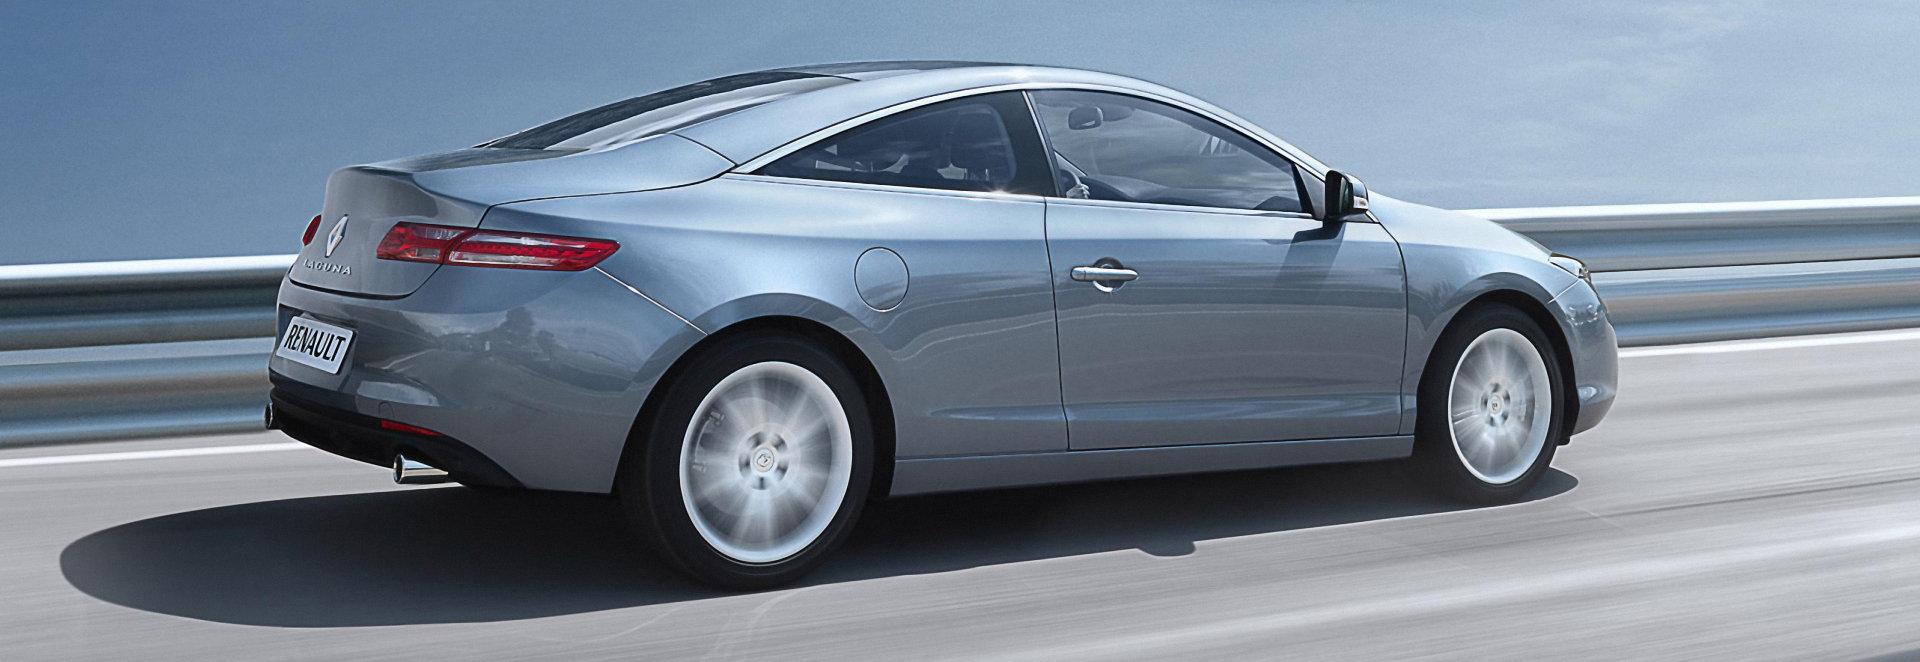 Coche del día: Renault Laguna Coupé